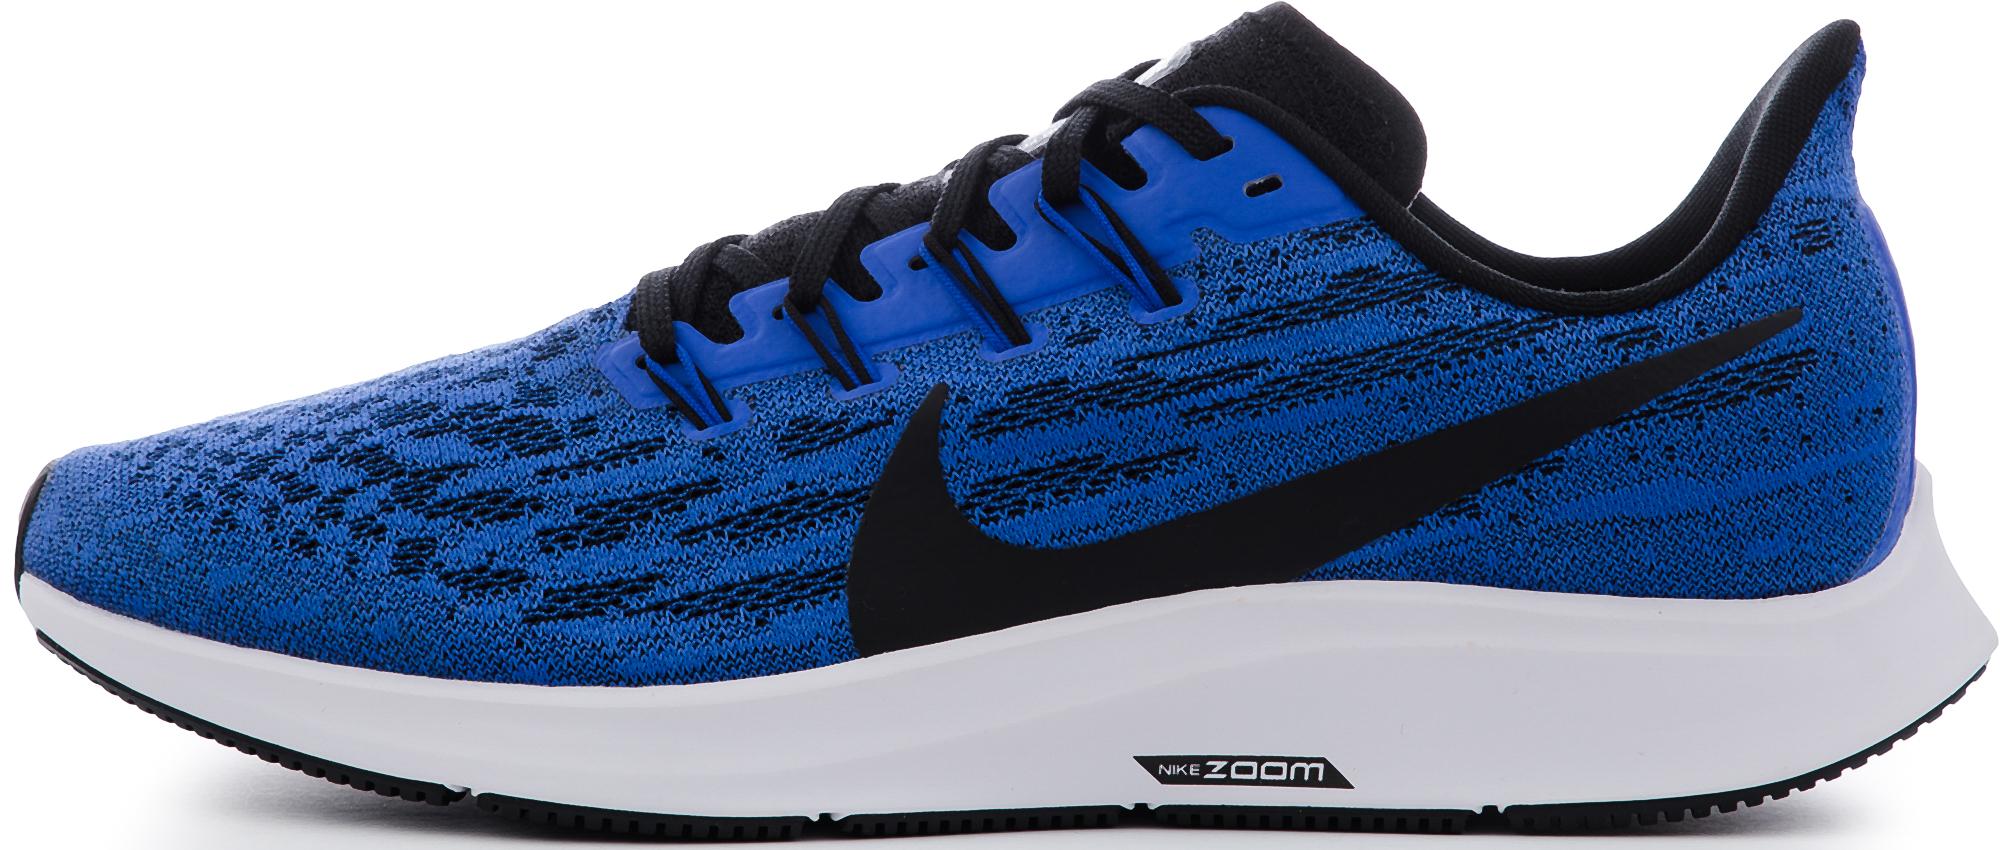 Nike Кроссовки мужские Air Zoom Pegasus 36, размер 46,5